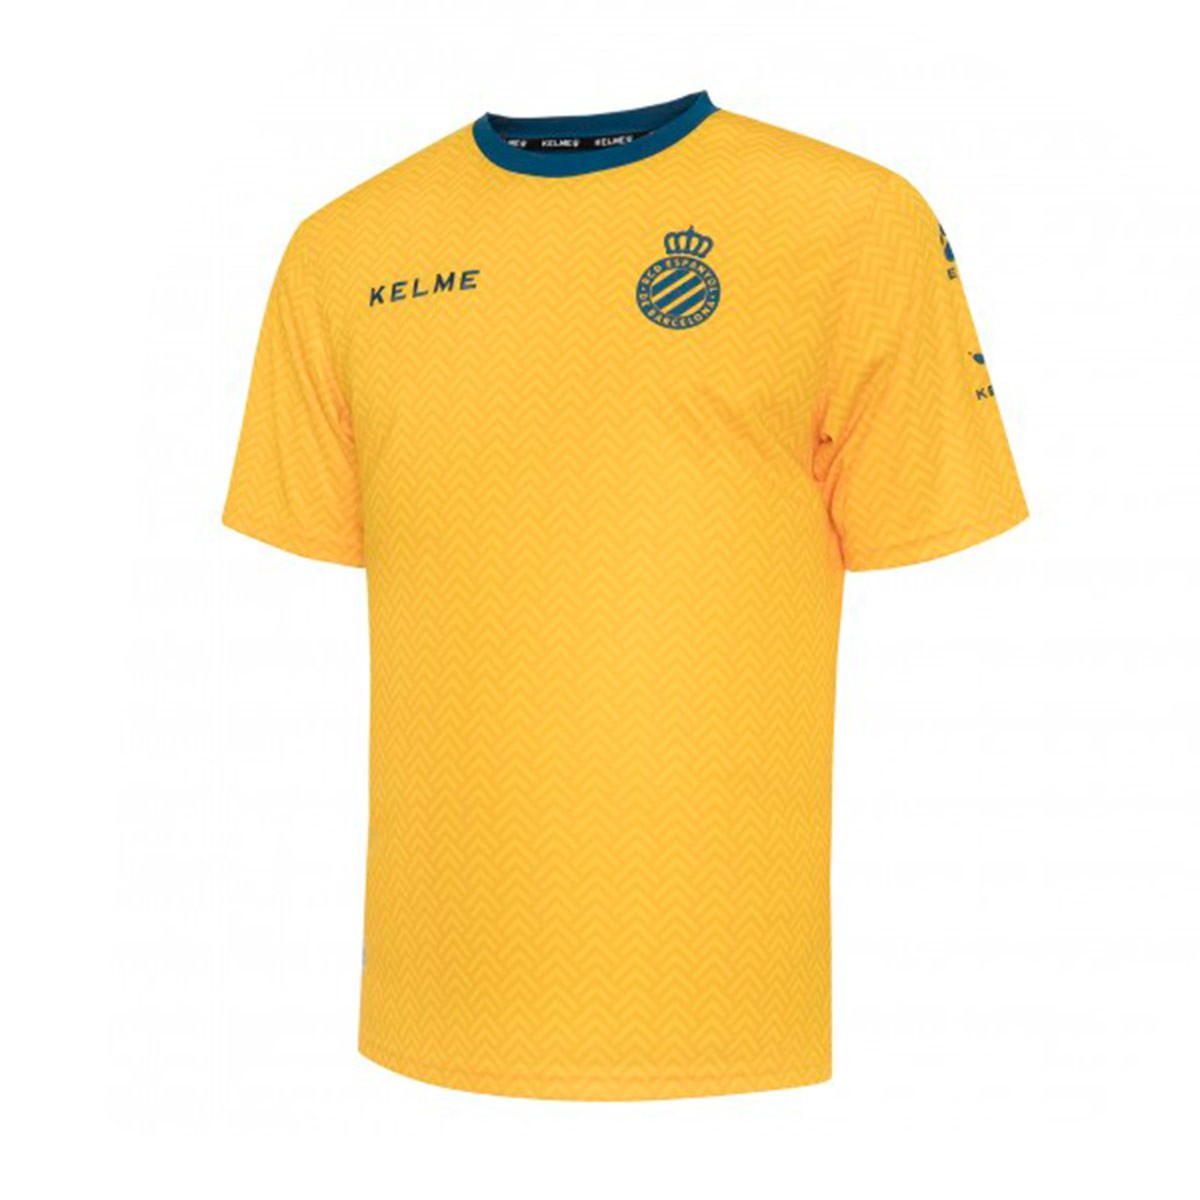 c2355b35c3e8c Jersey Kelme RCD Espanyol Training 2018-2019 Yellow - Tienda de ...